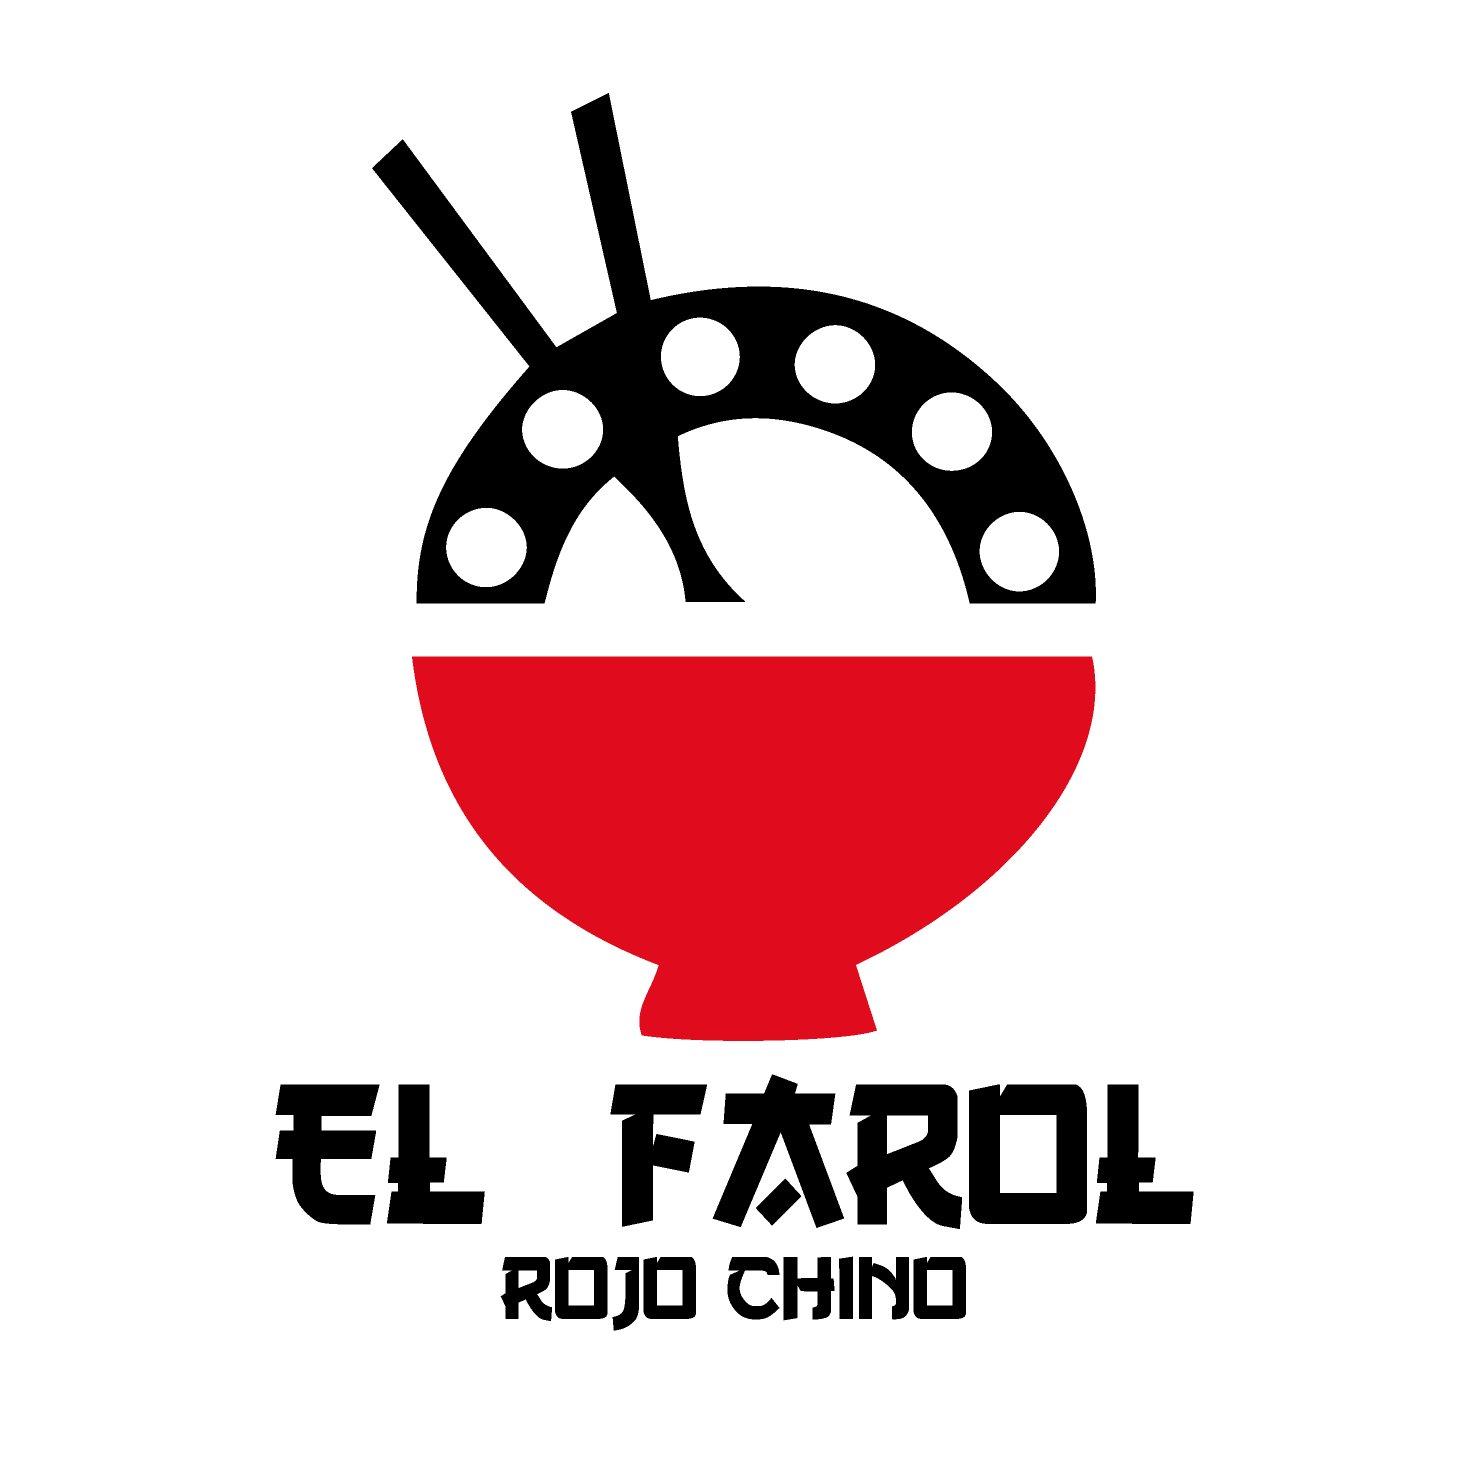 El Farol Rojo Chino